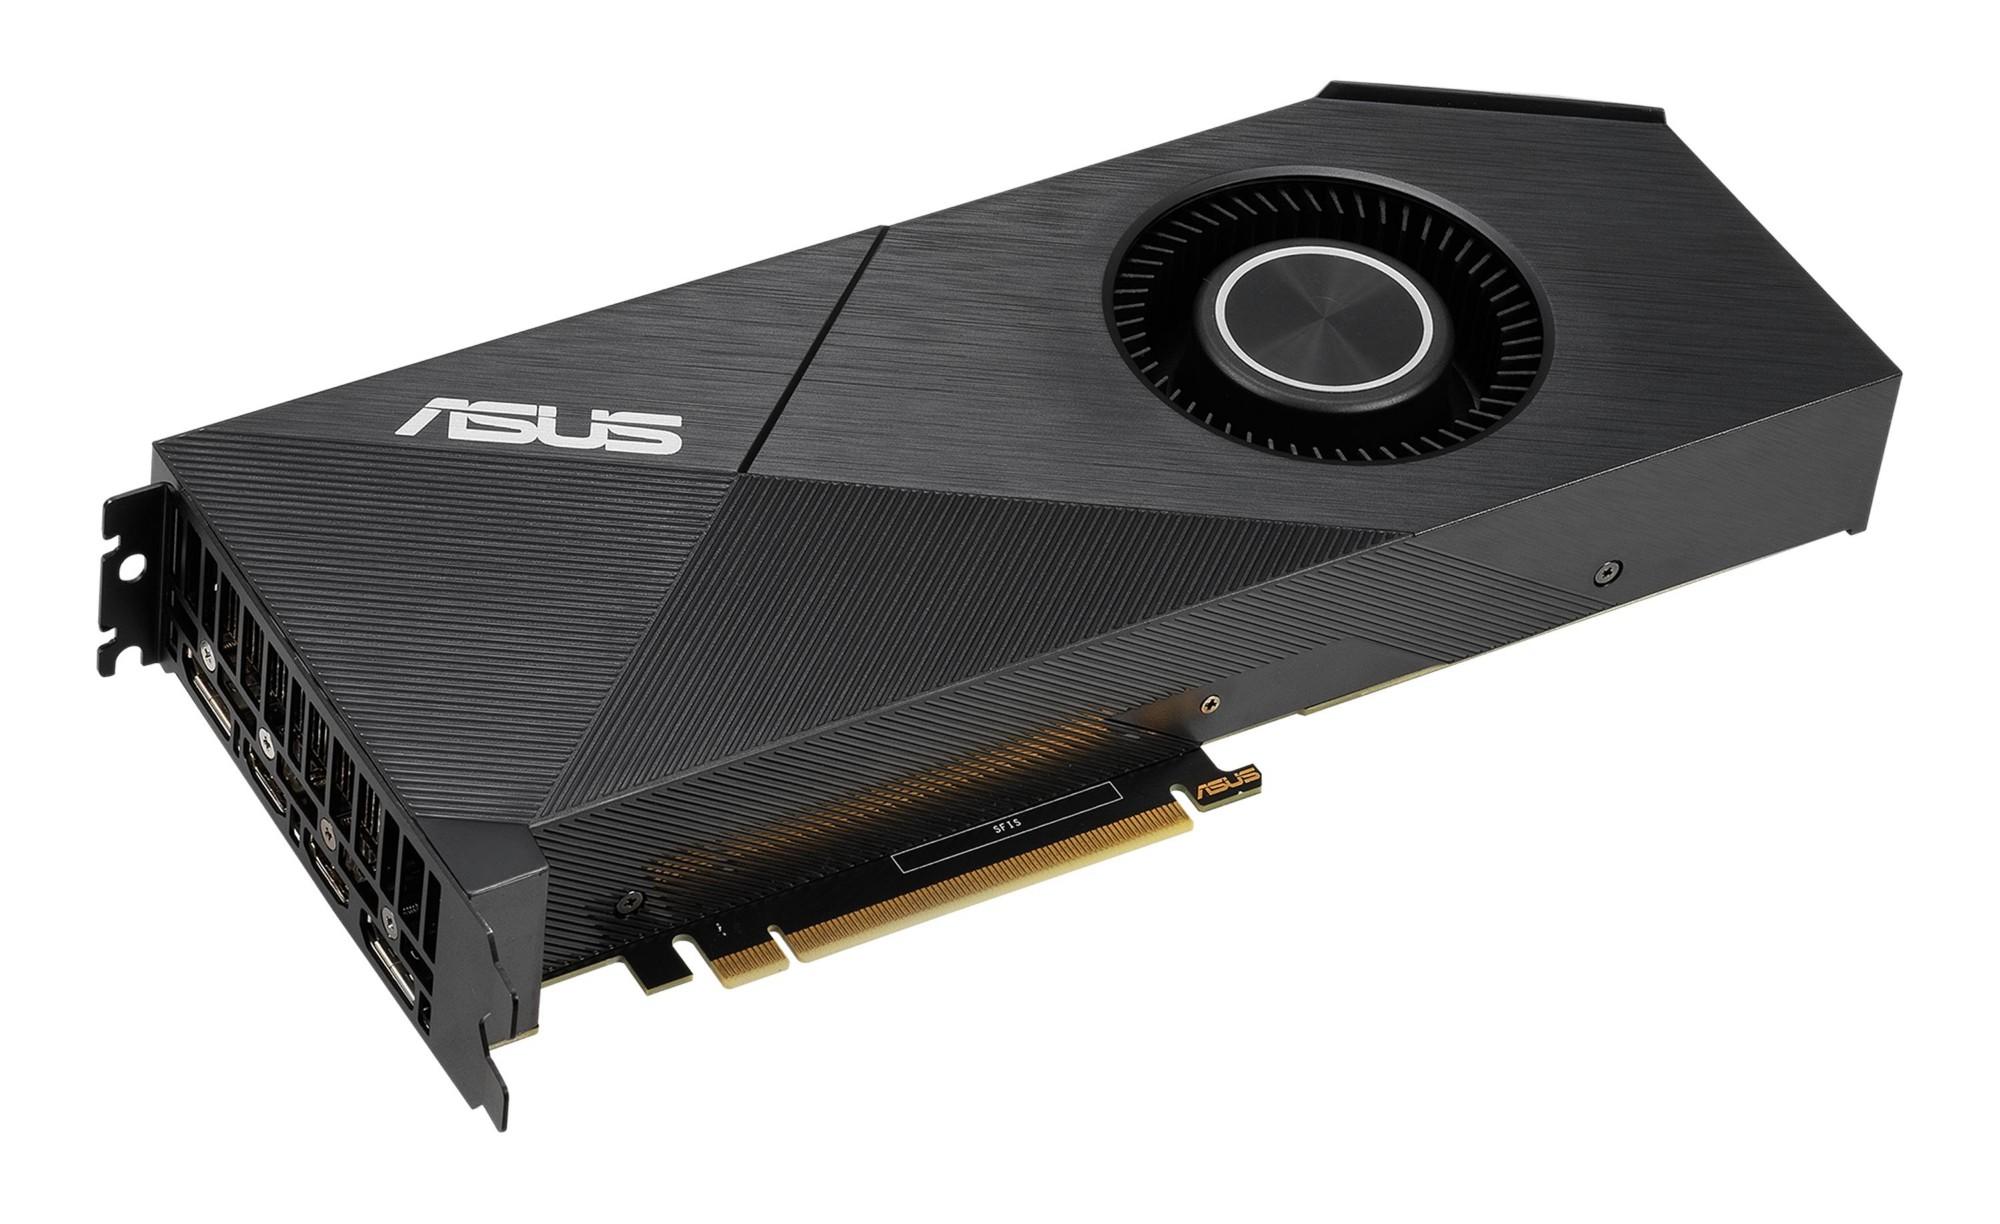 ASUS Turbo -RTX2060S-8G-EVO GeForce RTX 2060 SUPER 8 GB GDDR6